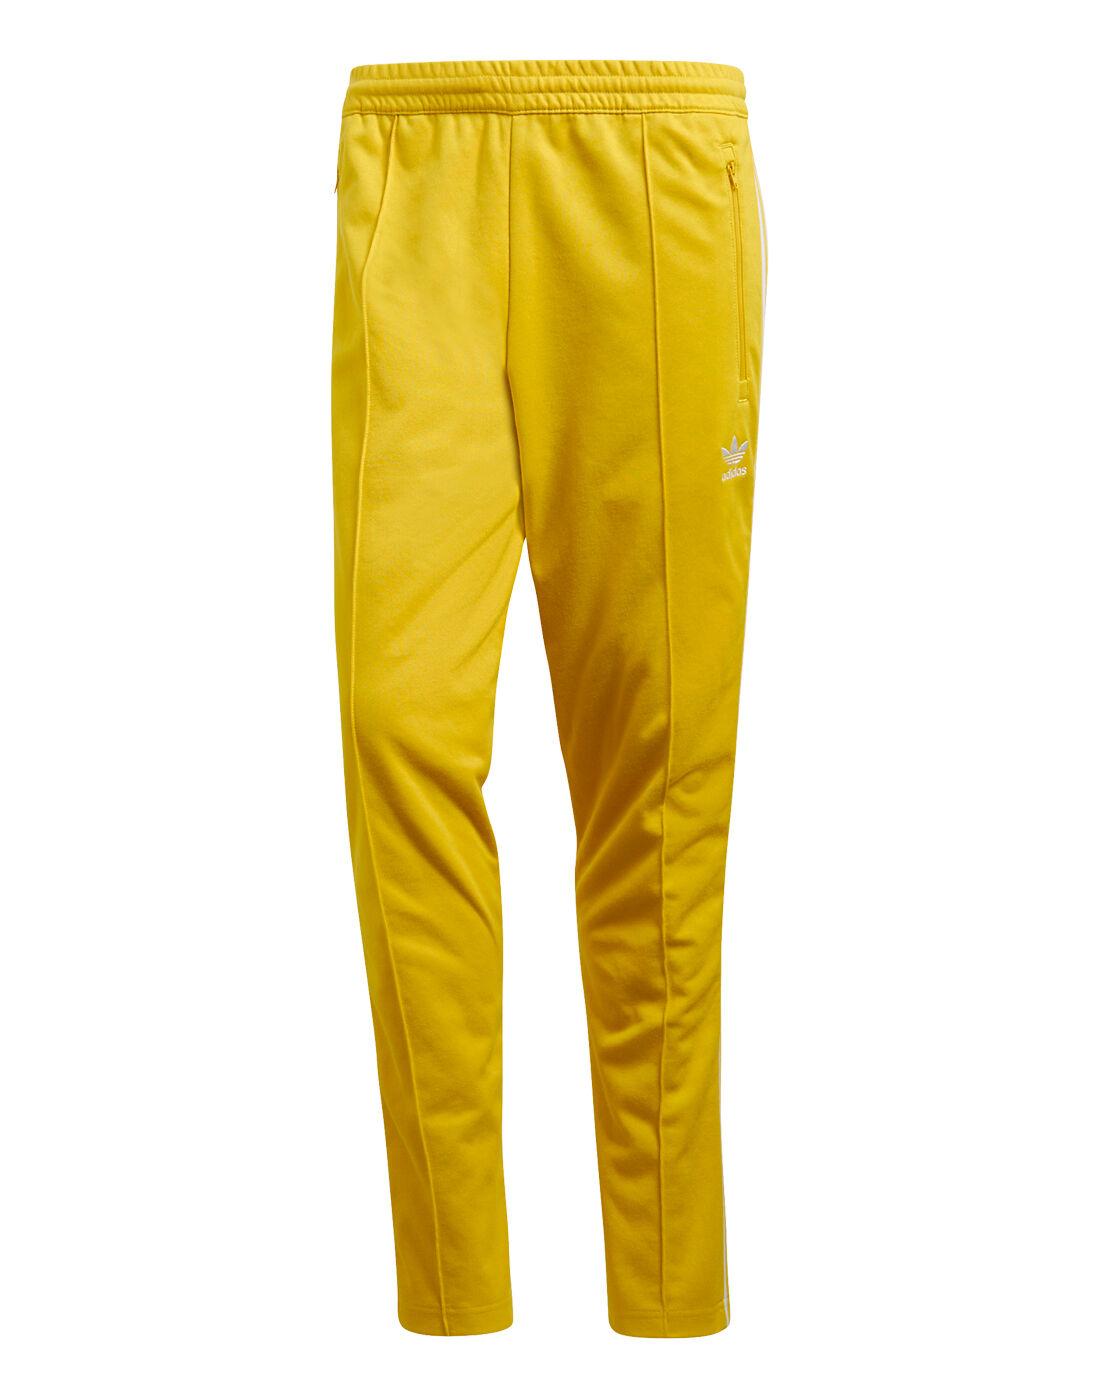 spain beckenbauer track pants yellow 07d94 e446c